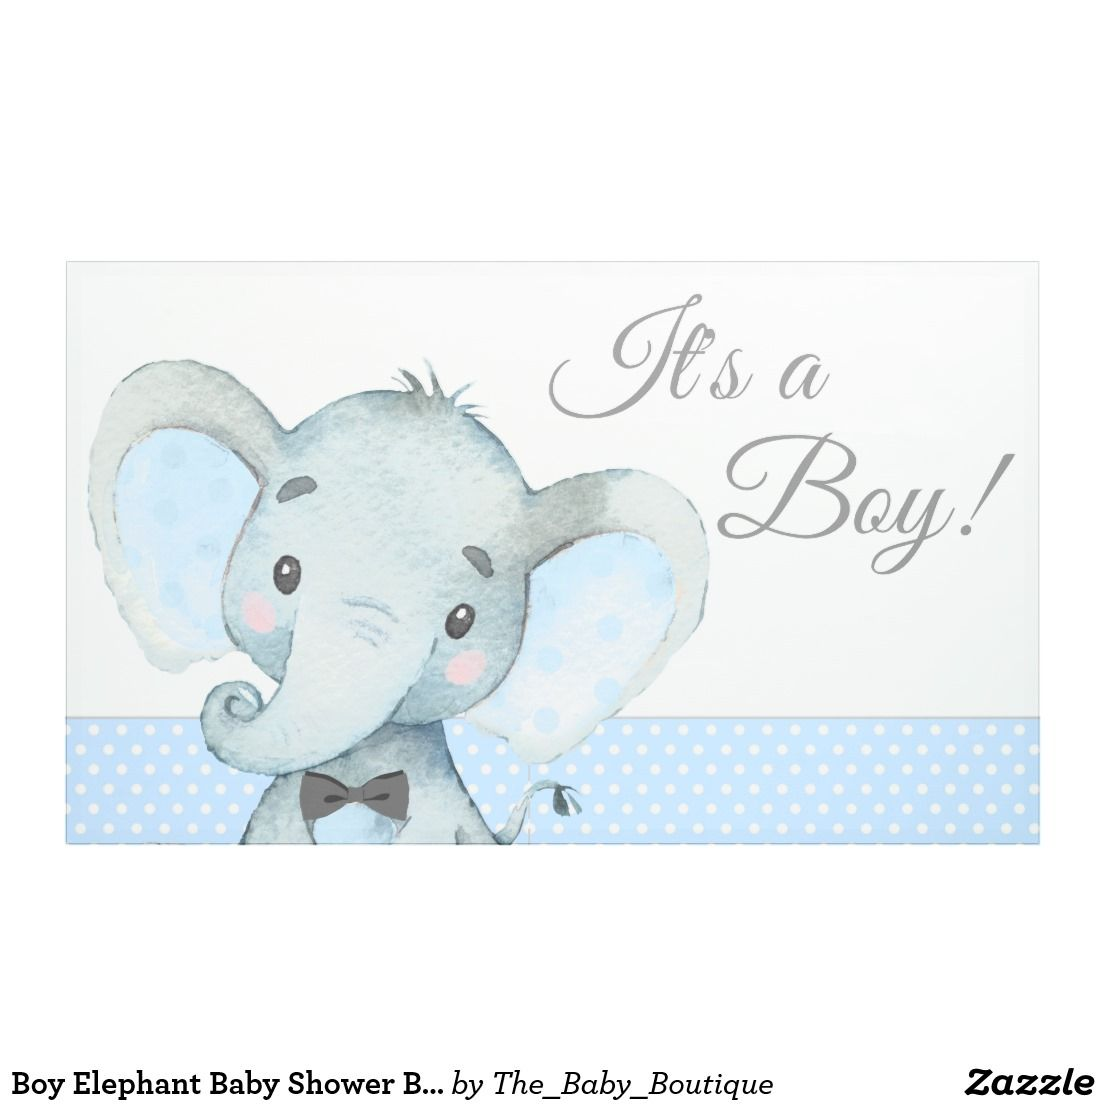 Boy Elephant Baby Shower Banners Zazzle Com Baby Shower Banner Elephant Baby Shower Banner Baby Shower Banner Boy